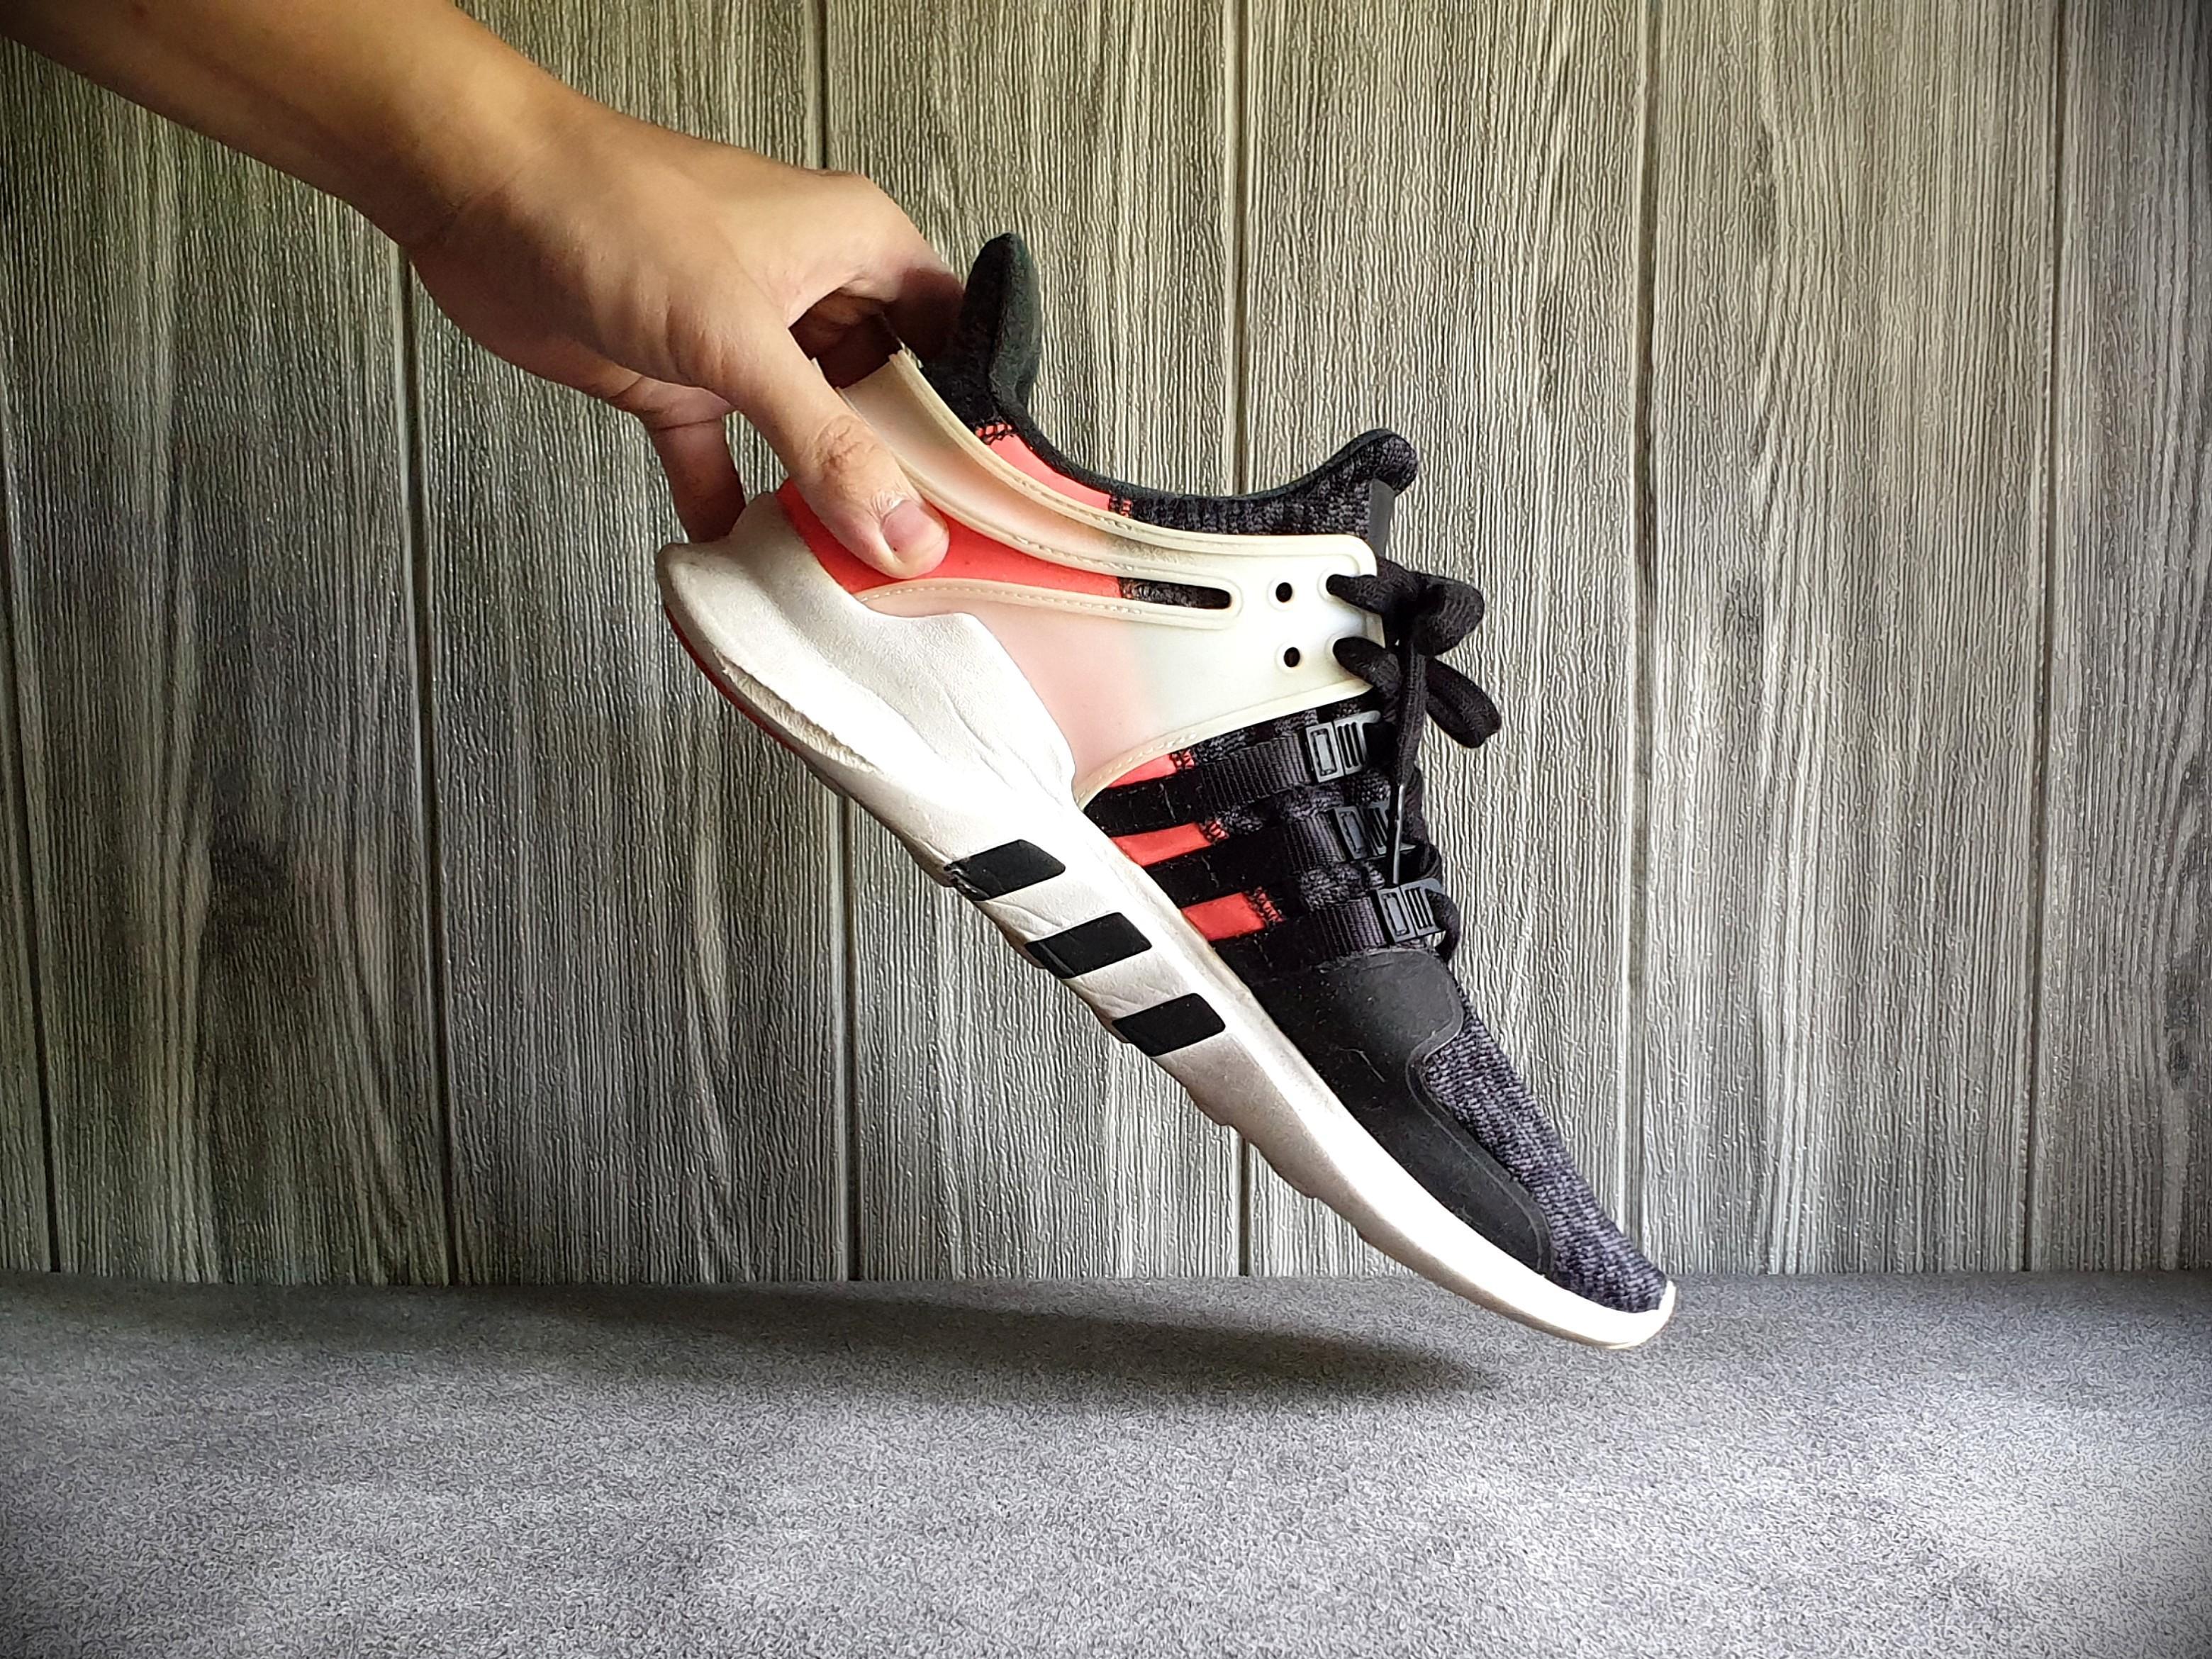 Adidas EQT Support AdV Solar Pink (US 10.5 / UK 10), Men's Fashion ...